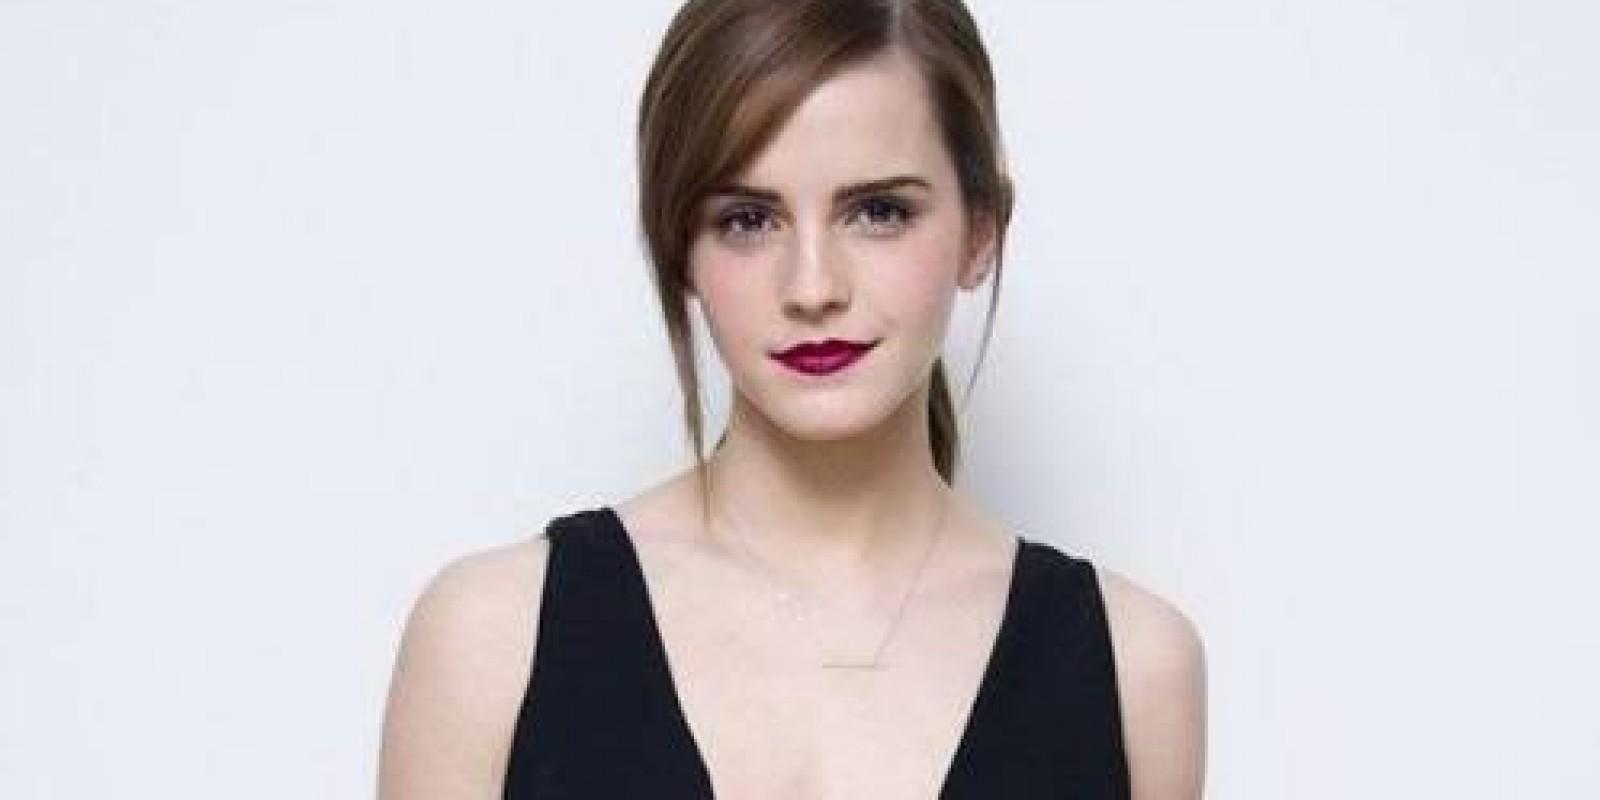 [Emma Watson escondeu 100 livros feministas no metrô de Londres]